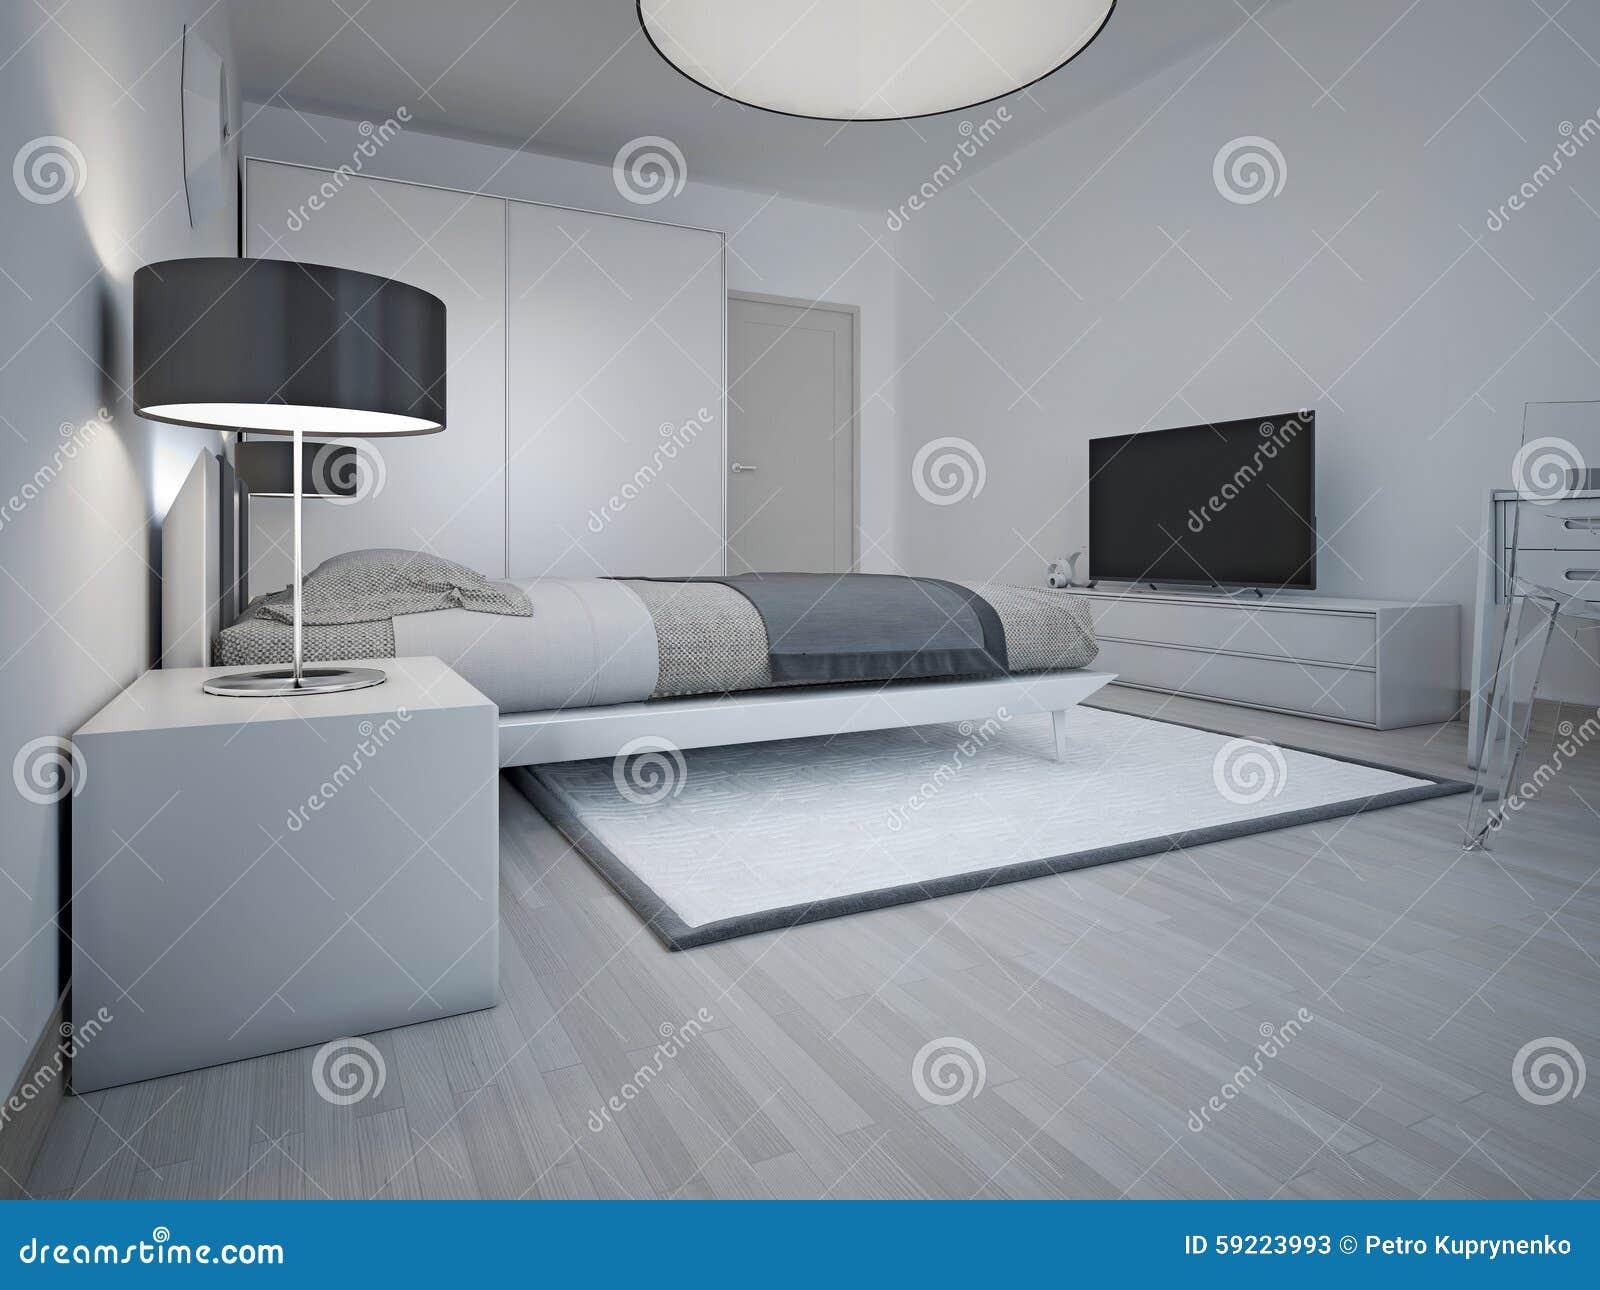 Slaapkamer zwart idee - Slaapkamer idee ...